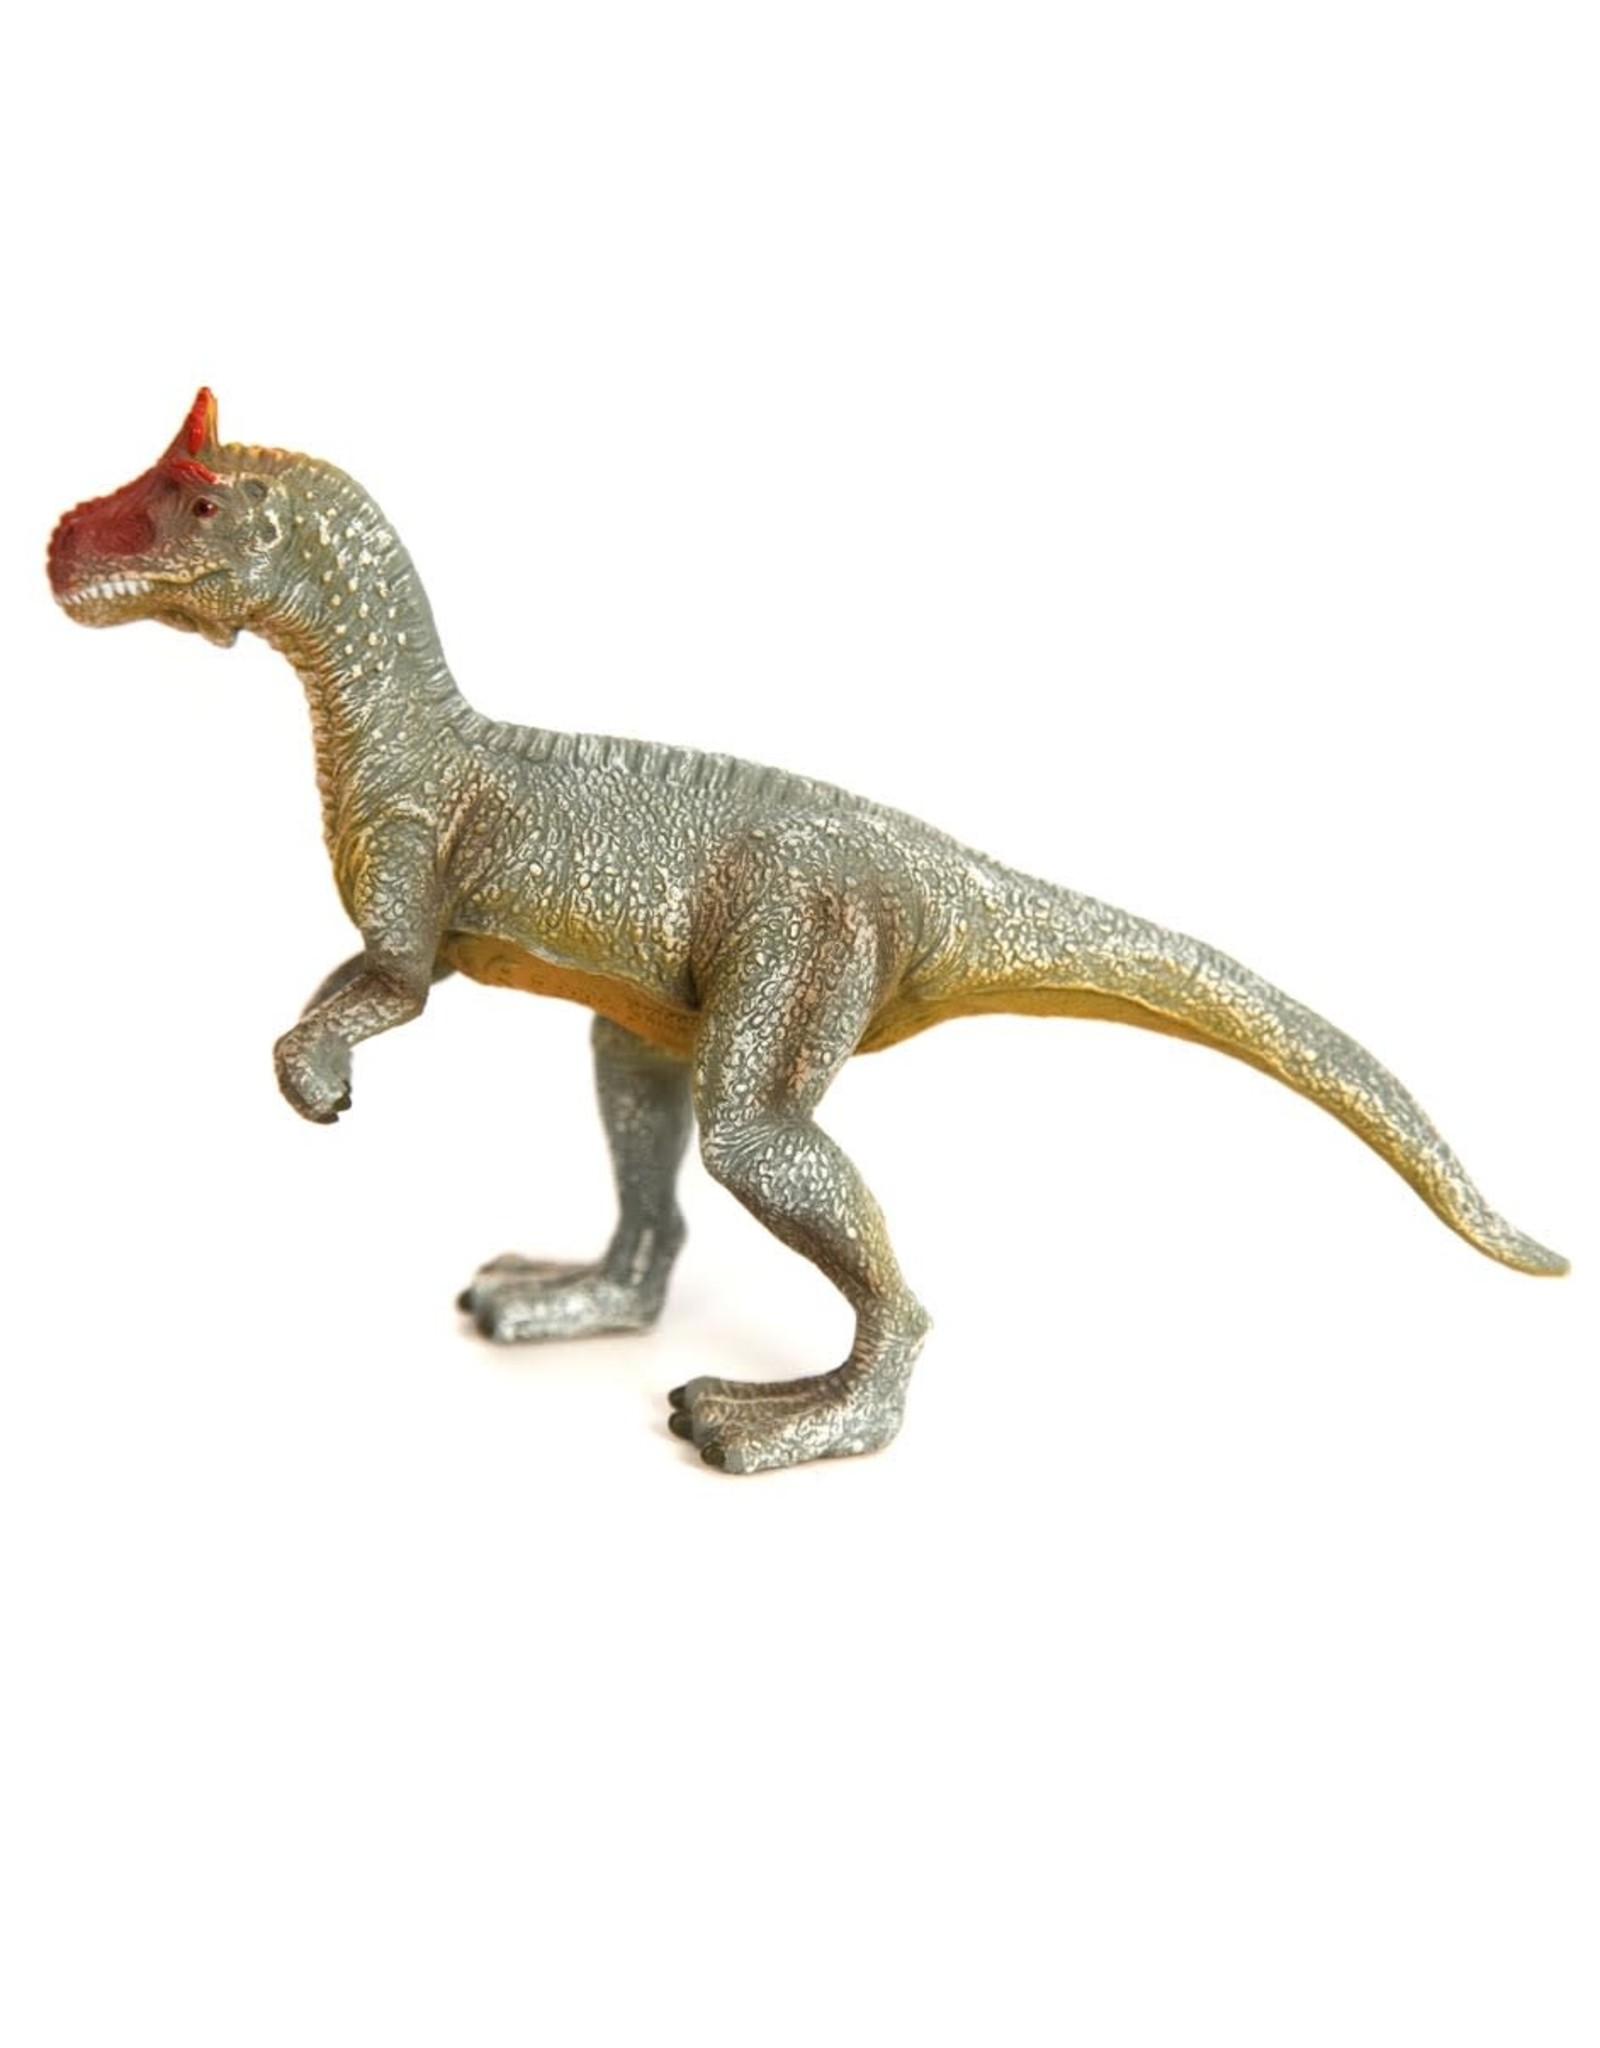 CollectA Cryolophosaurus